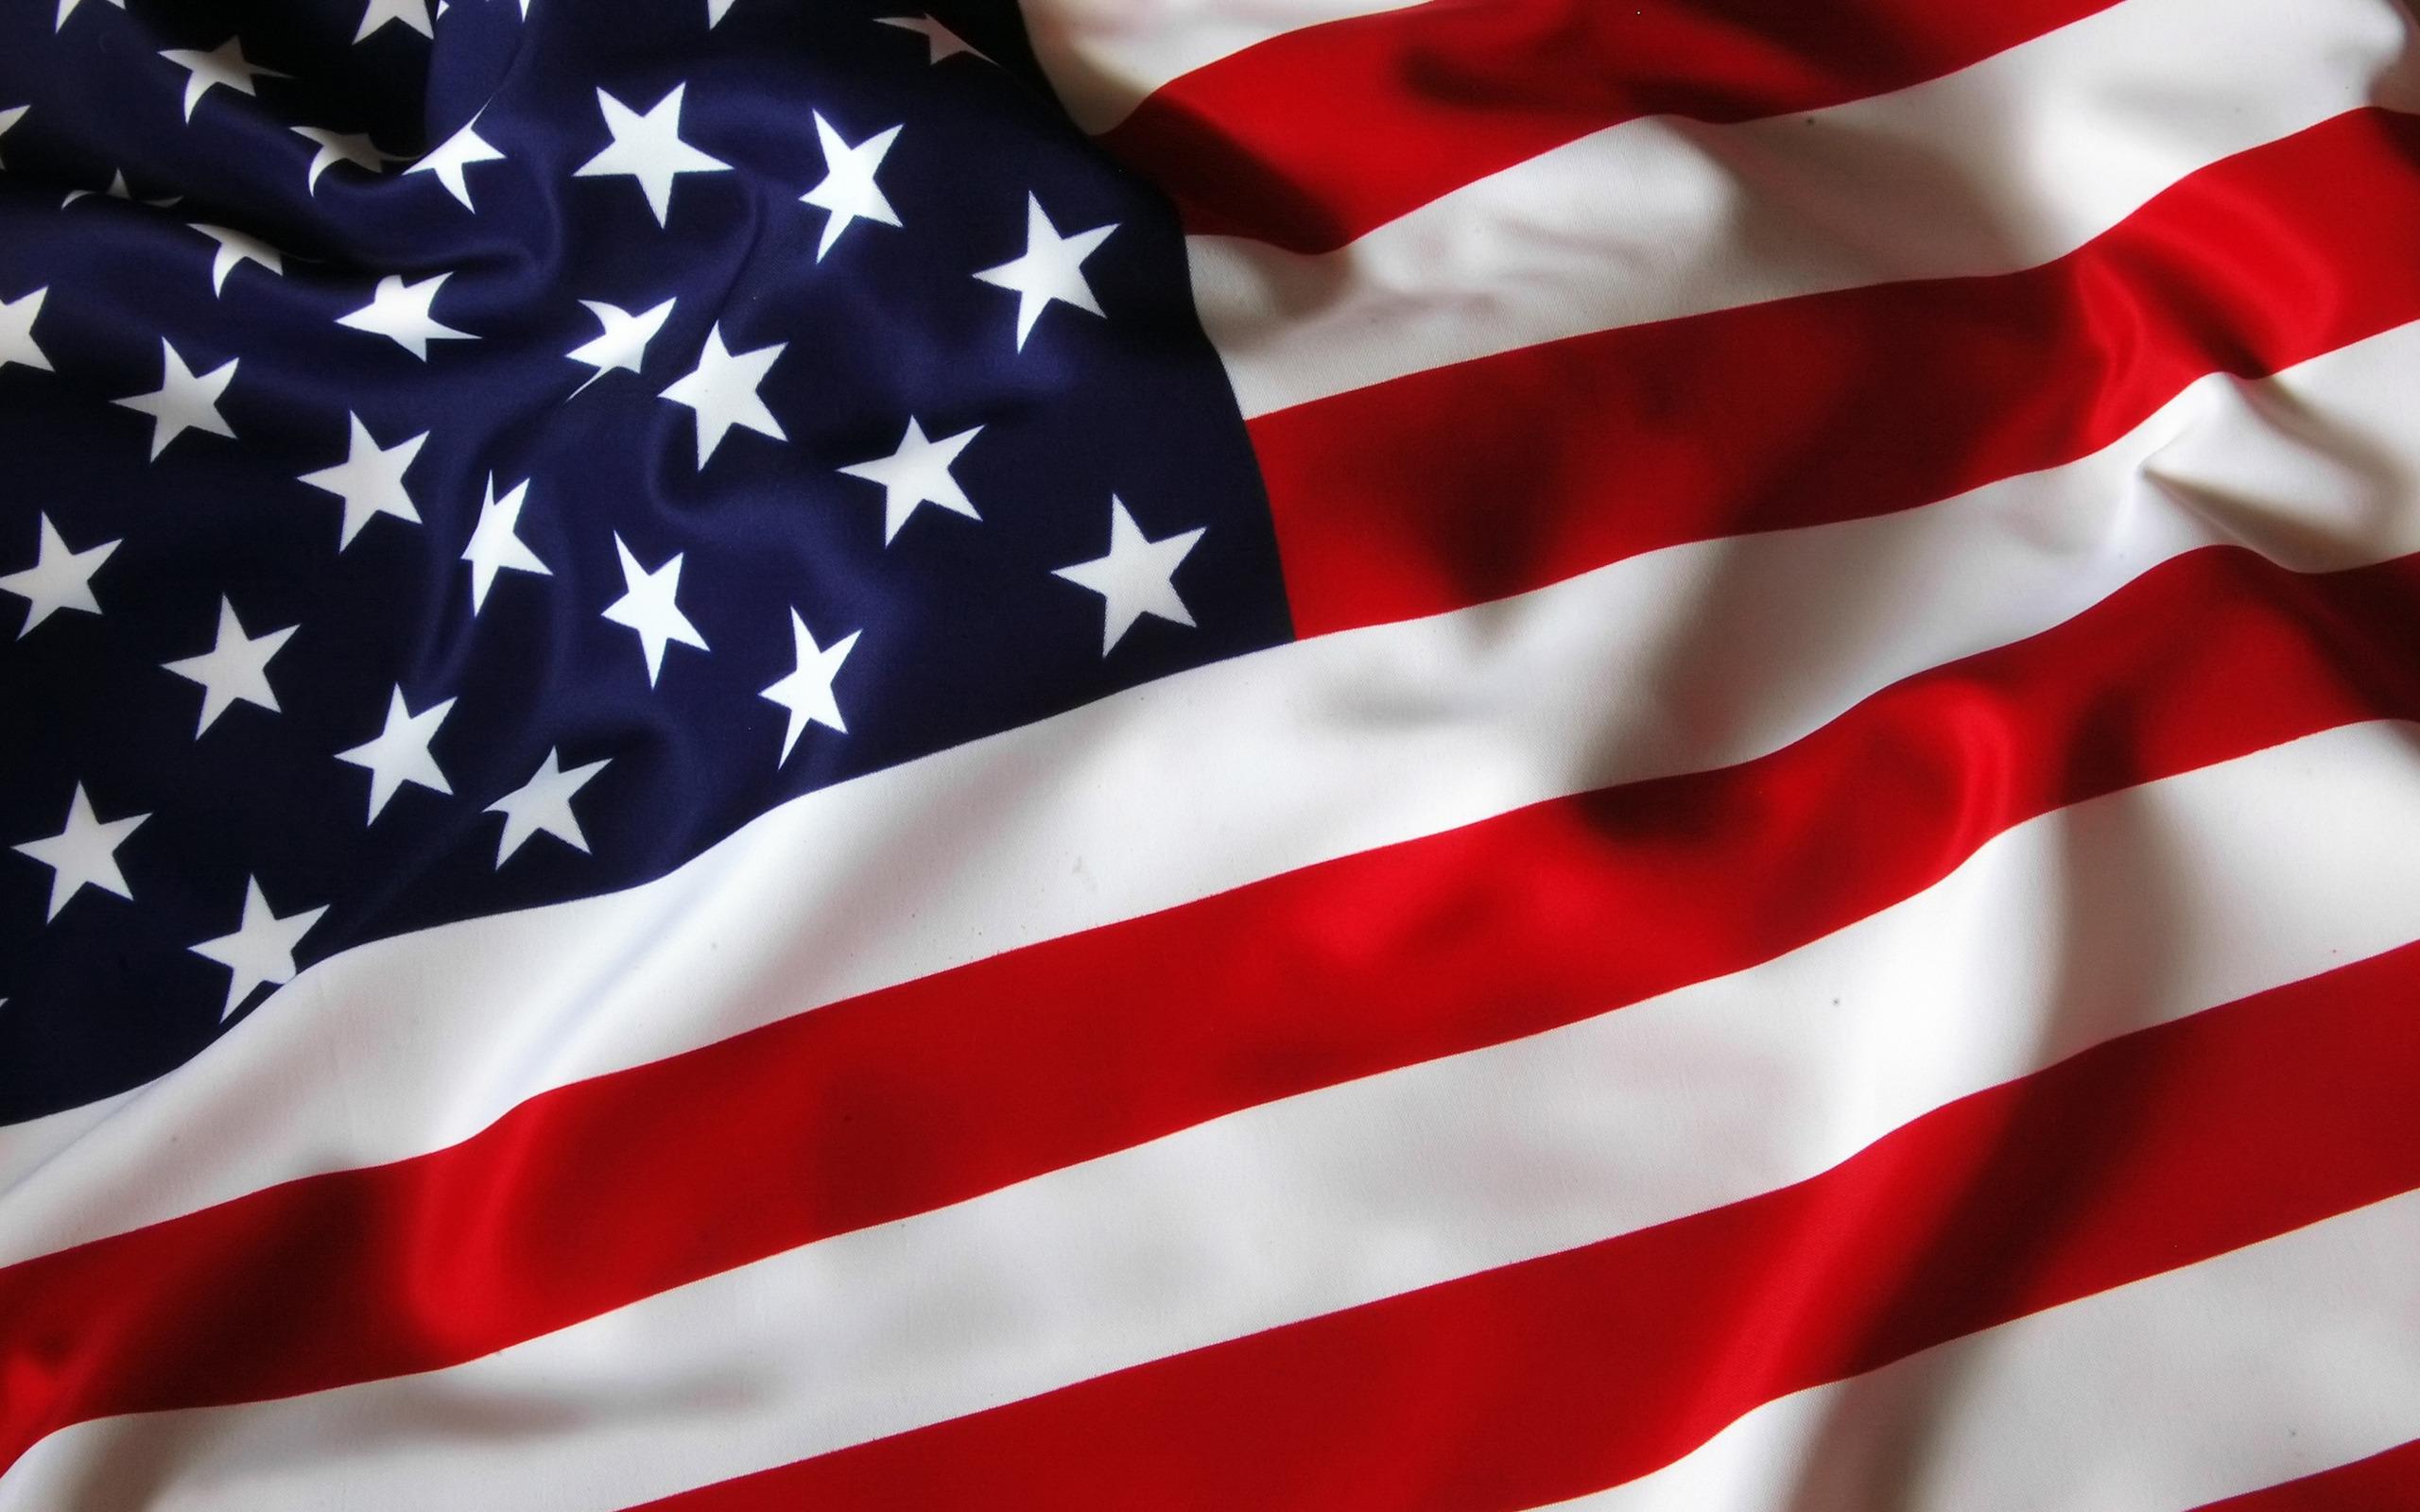 American Flagjpg 2560x1600